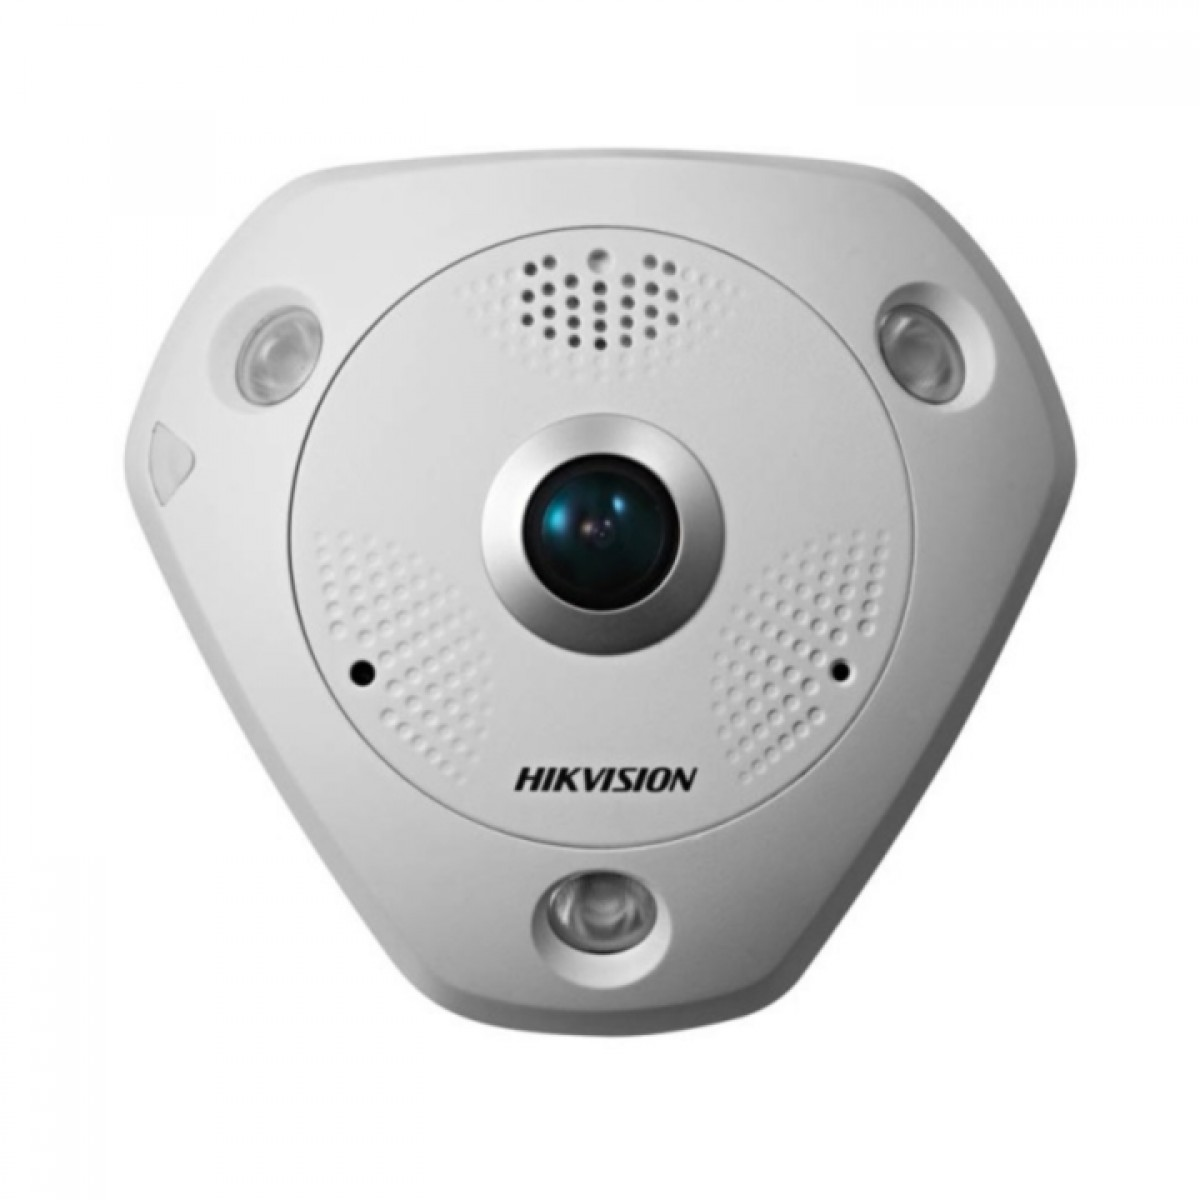 Camera IP Fisheye hồng ngoại 6.0 Megapixel HIKVSION DS-2CD6362F-I